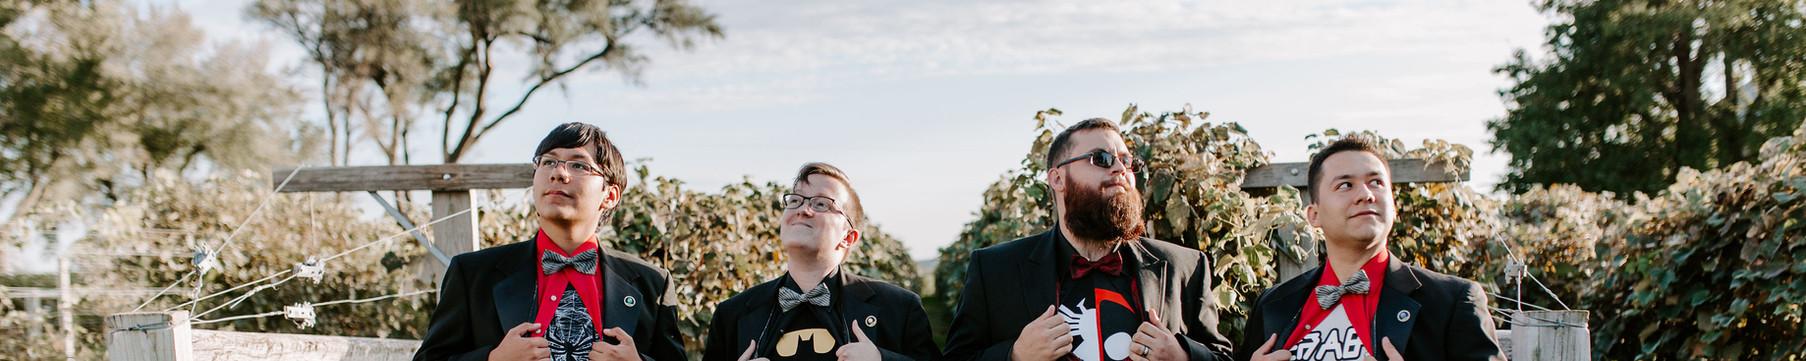 upton_wedding-283.jpg